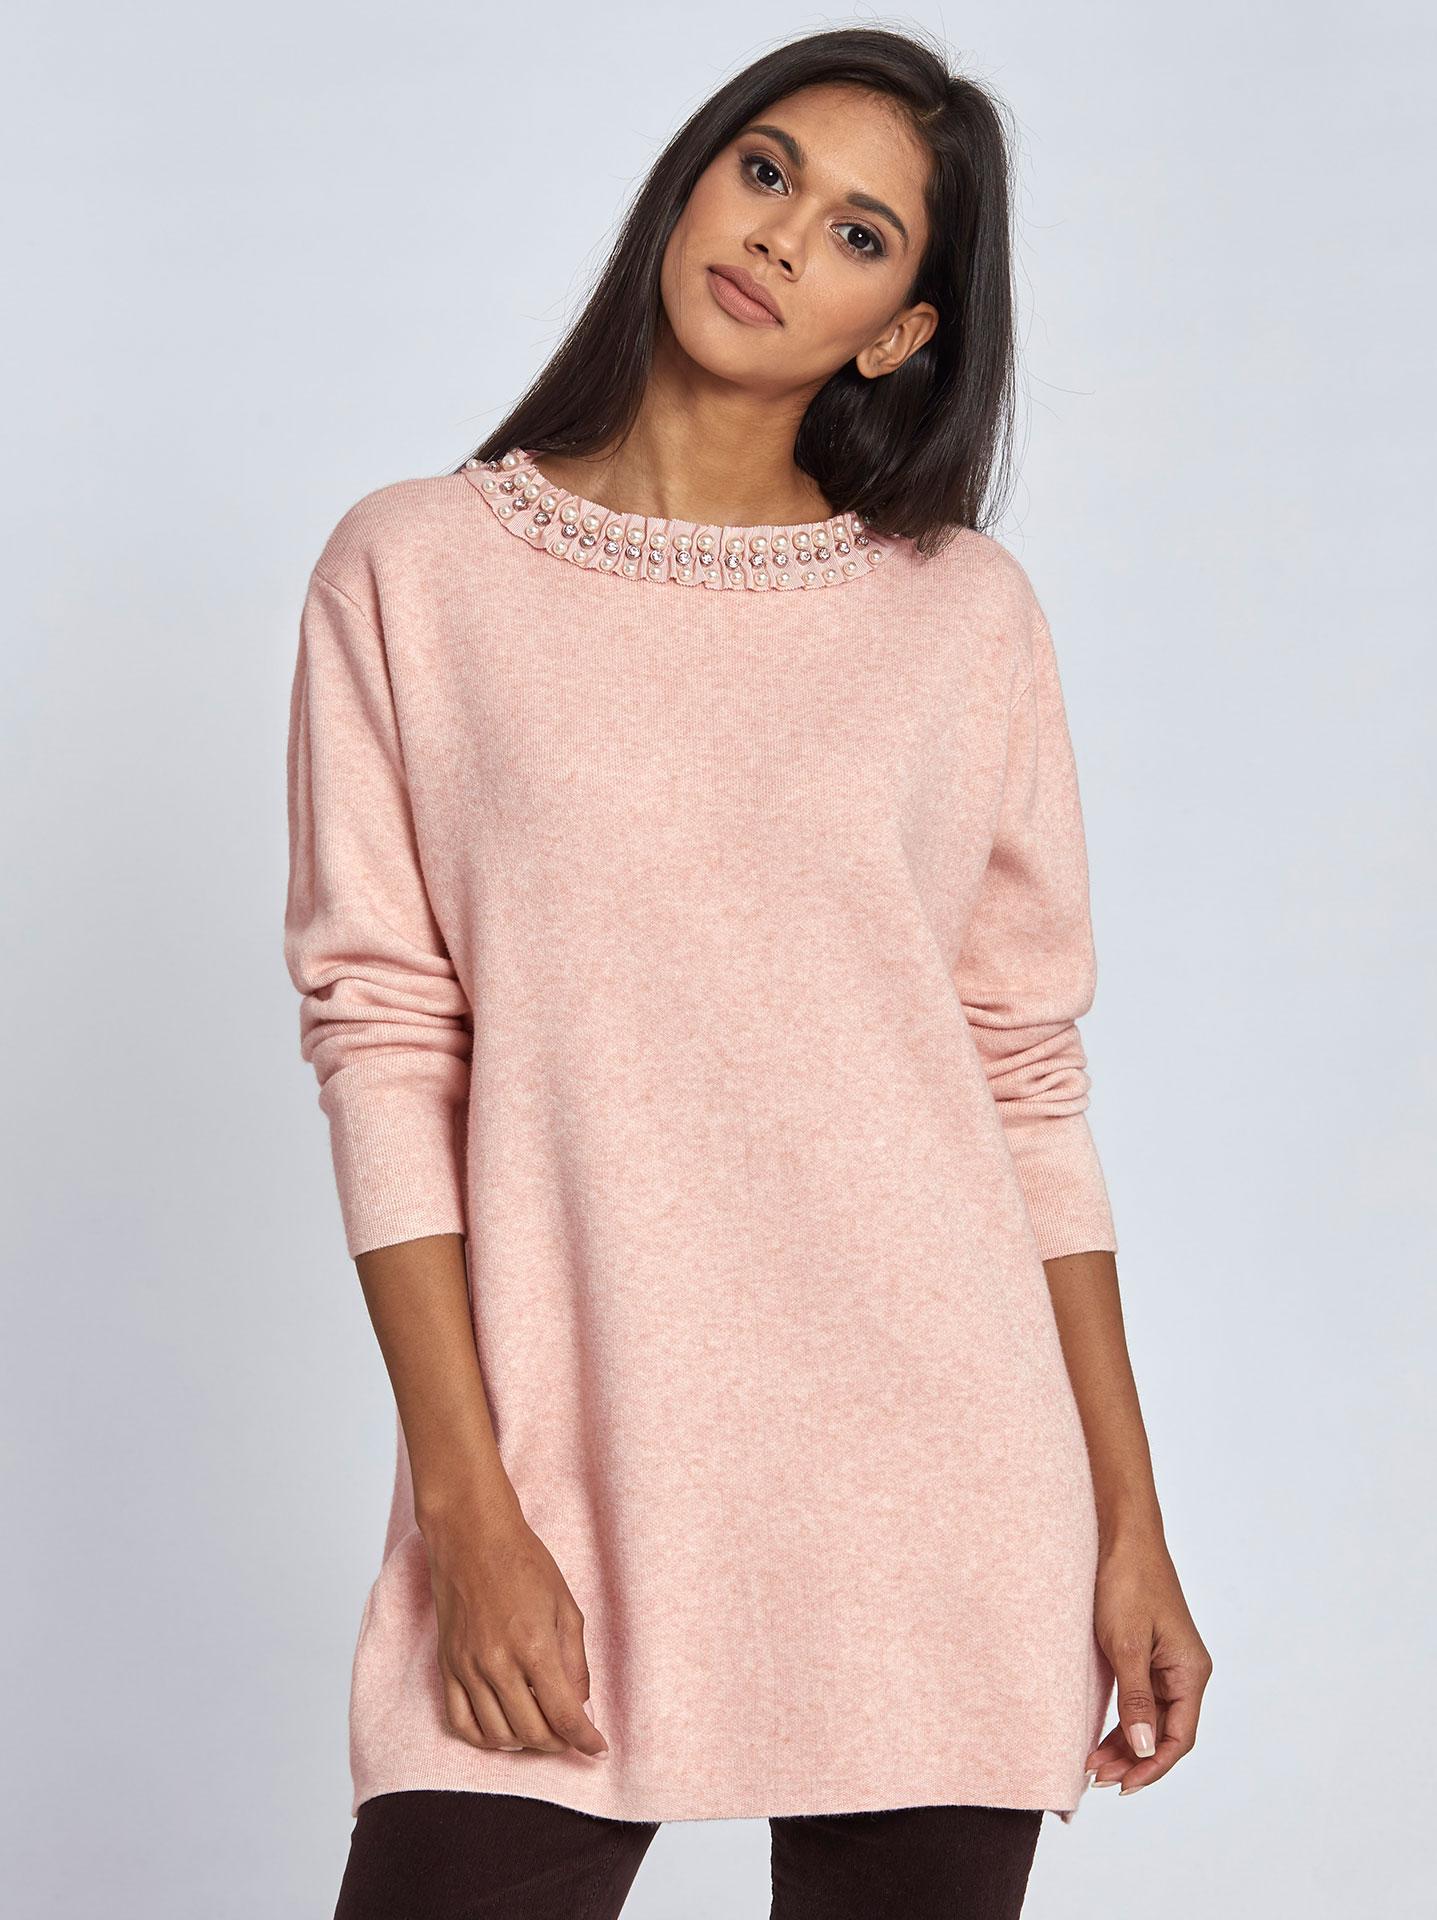 66f5278caa1a Μακρύ πουλόβερ με πέρλες και strass σε ροζ